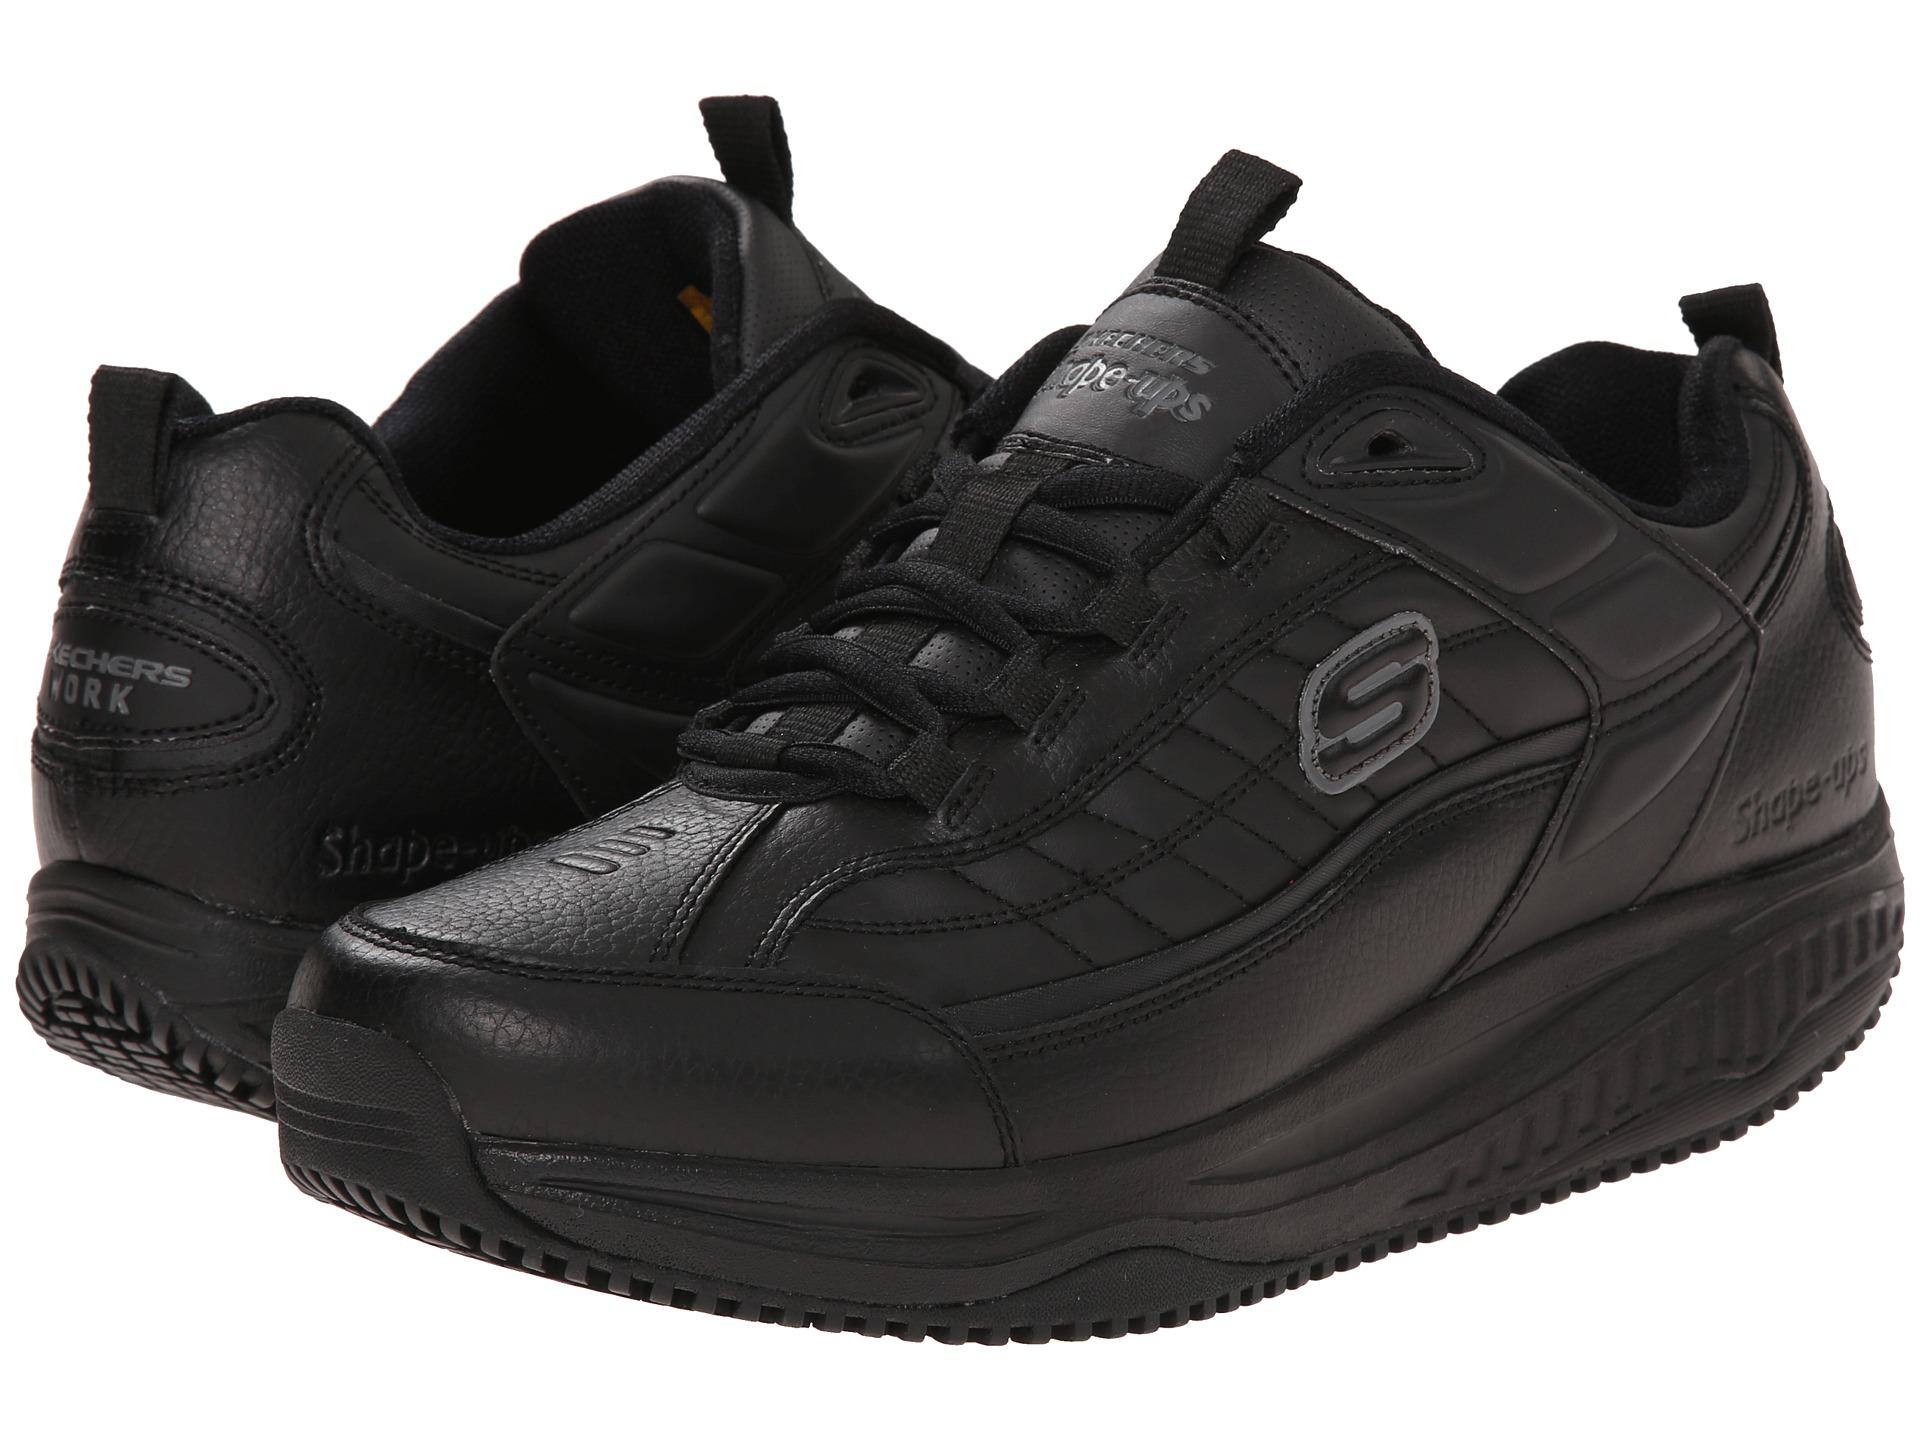 Sketchy Running Shoe